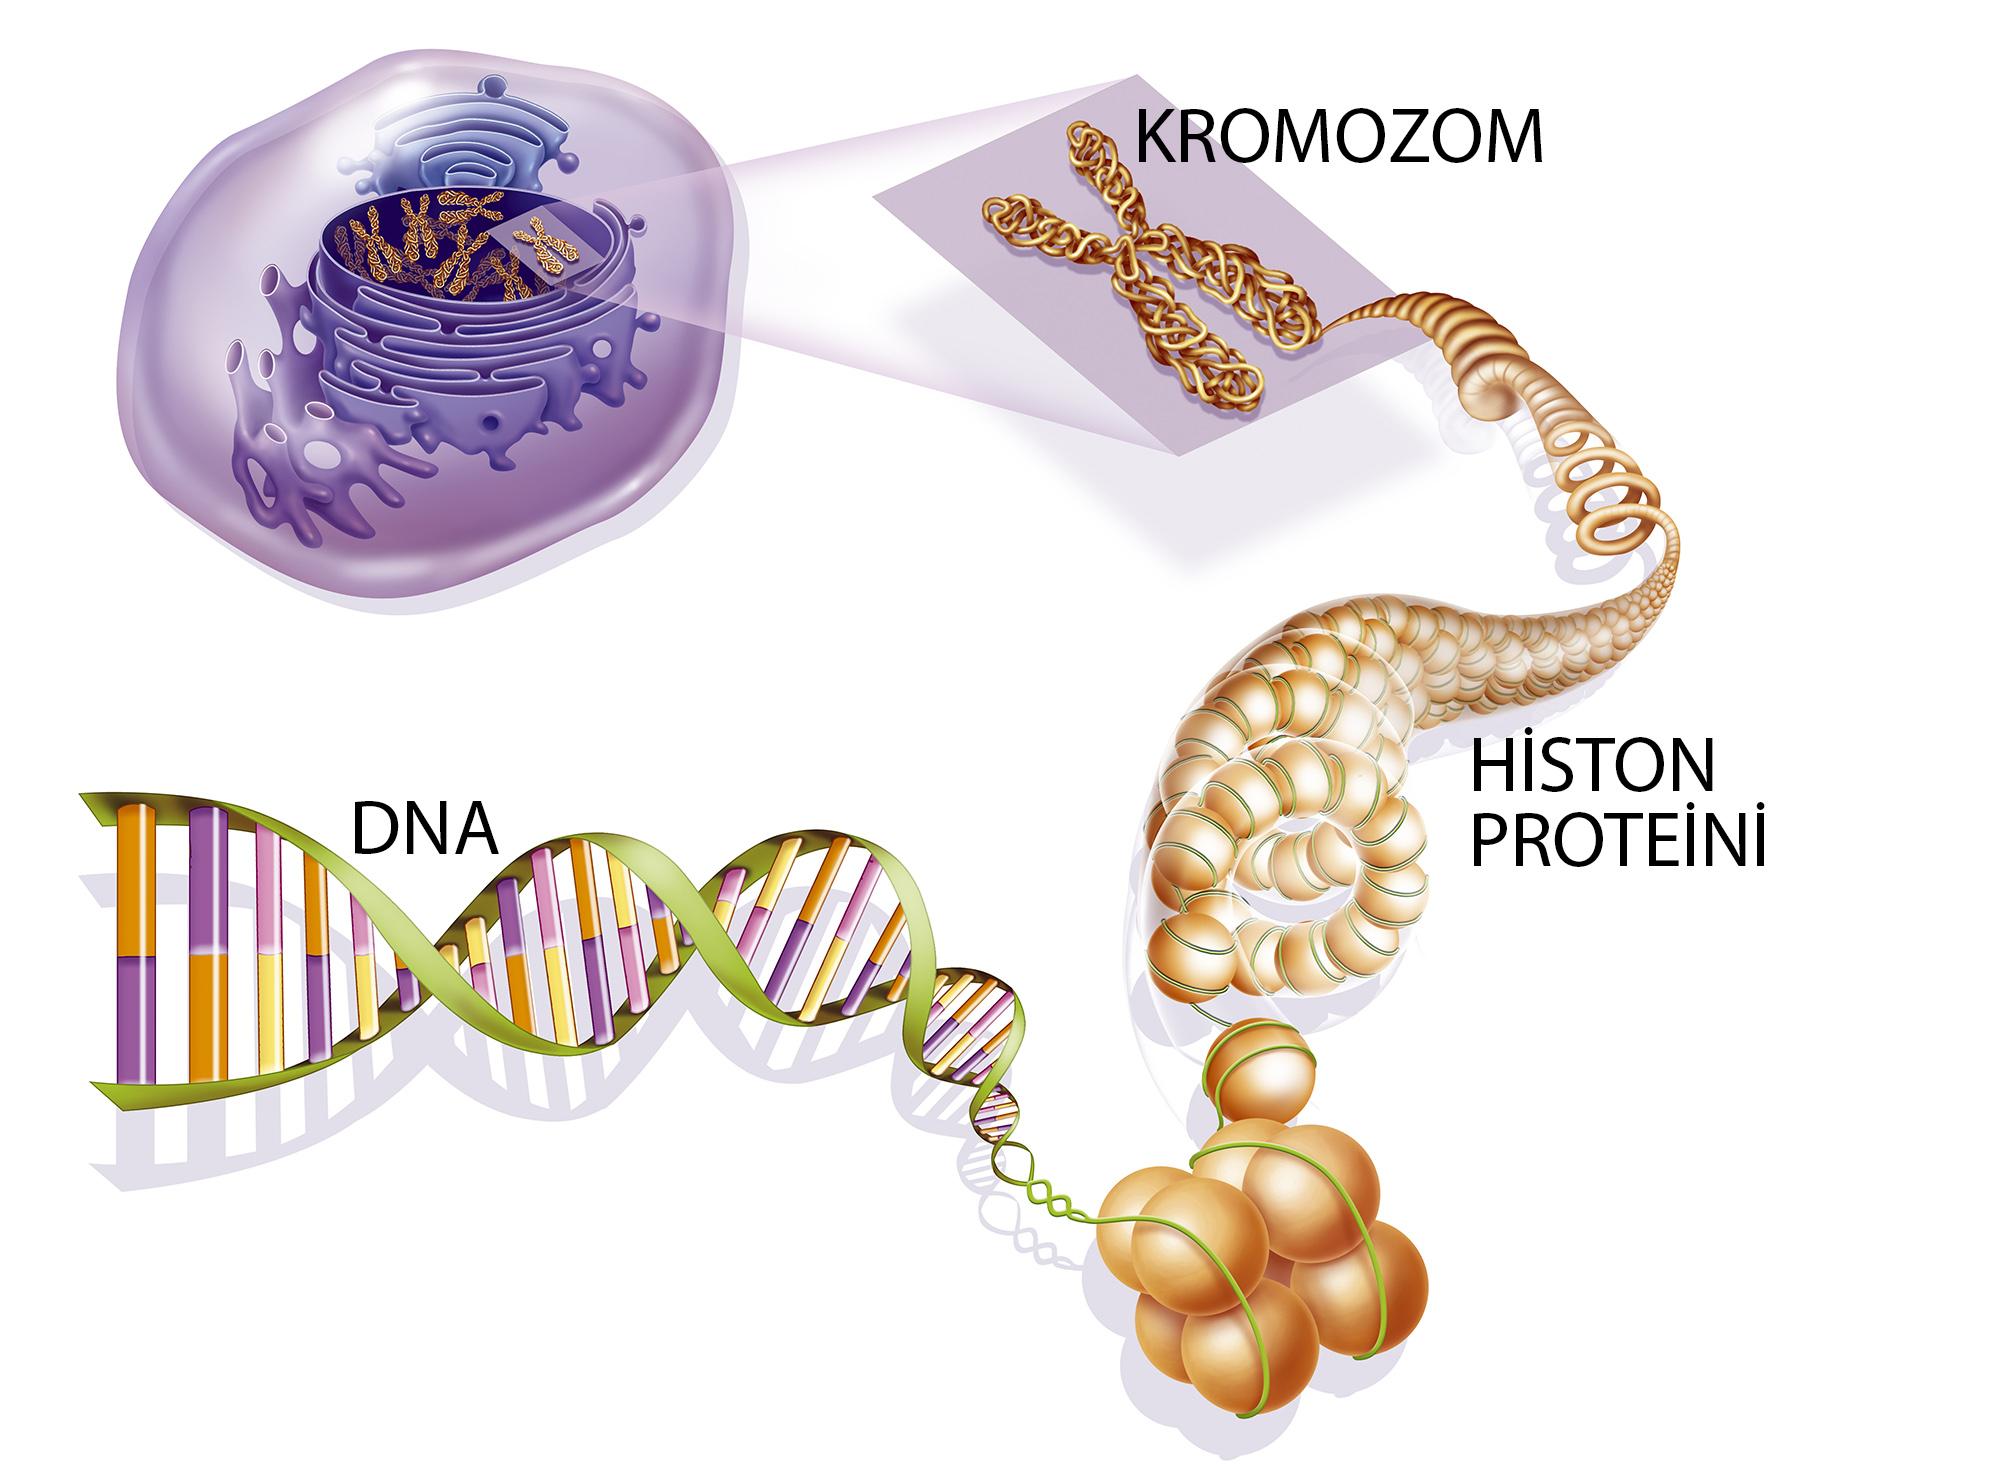 data-cke-saved-src=https://bilimgenc.tubitak.gov.tr/sites/default/files/dna-histone-kromozom.jpg